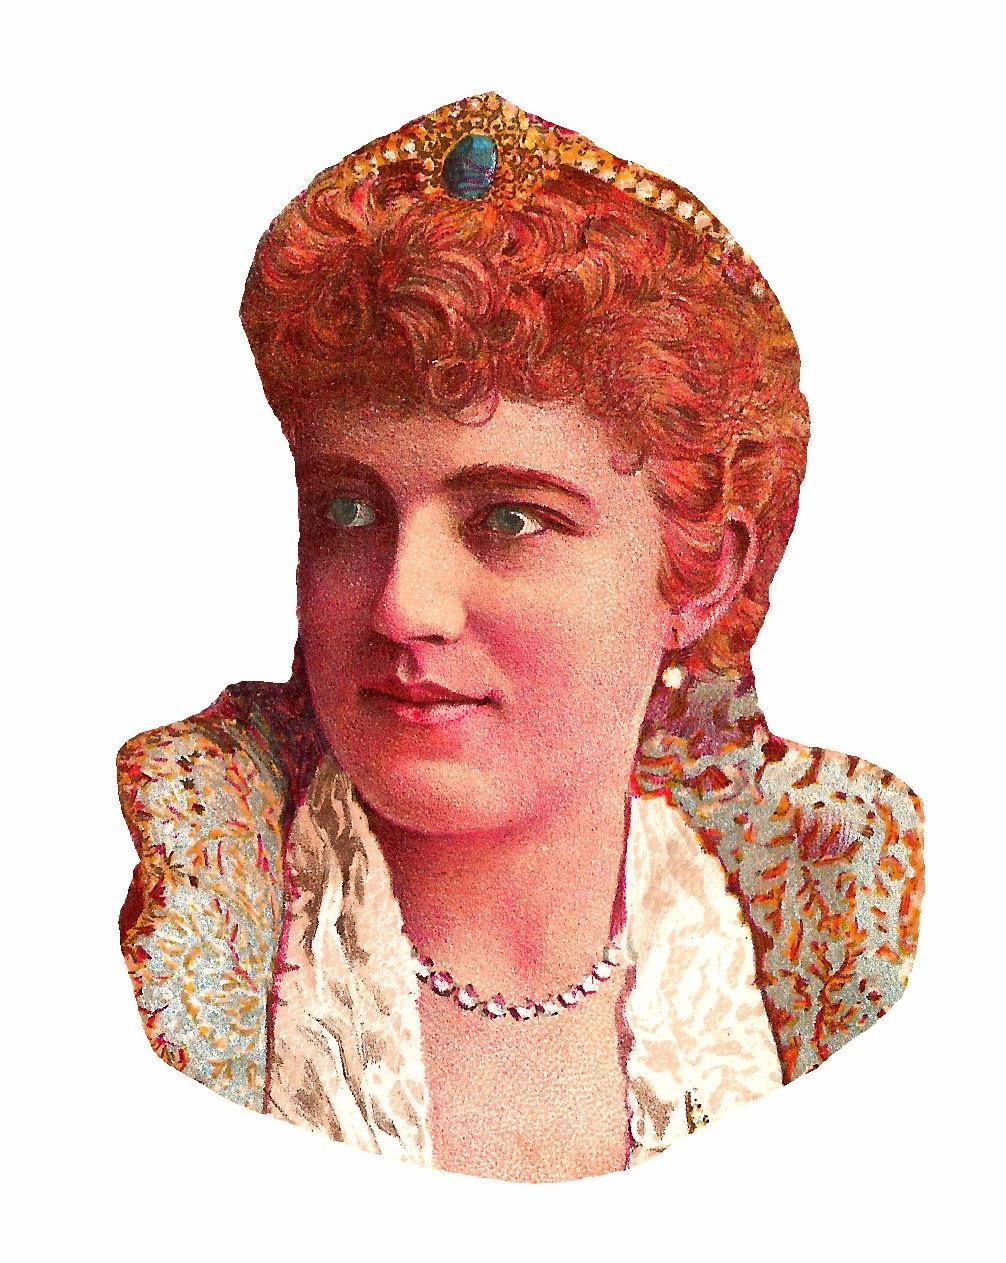 http://4.bp.blogspot.com/-VamMNmup2Ms/VMqEV2G5DmI/AAAAAAAAVYo/ovi5PfB1dDw/s1600/woman_portrait_royalty_gem_tiara-2.jpg